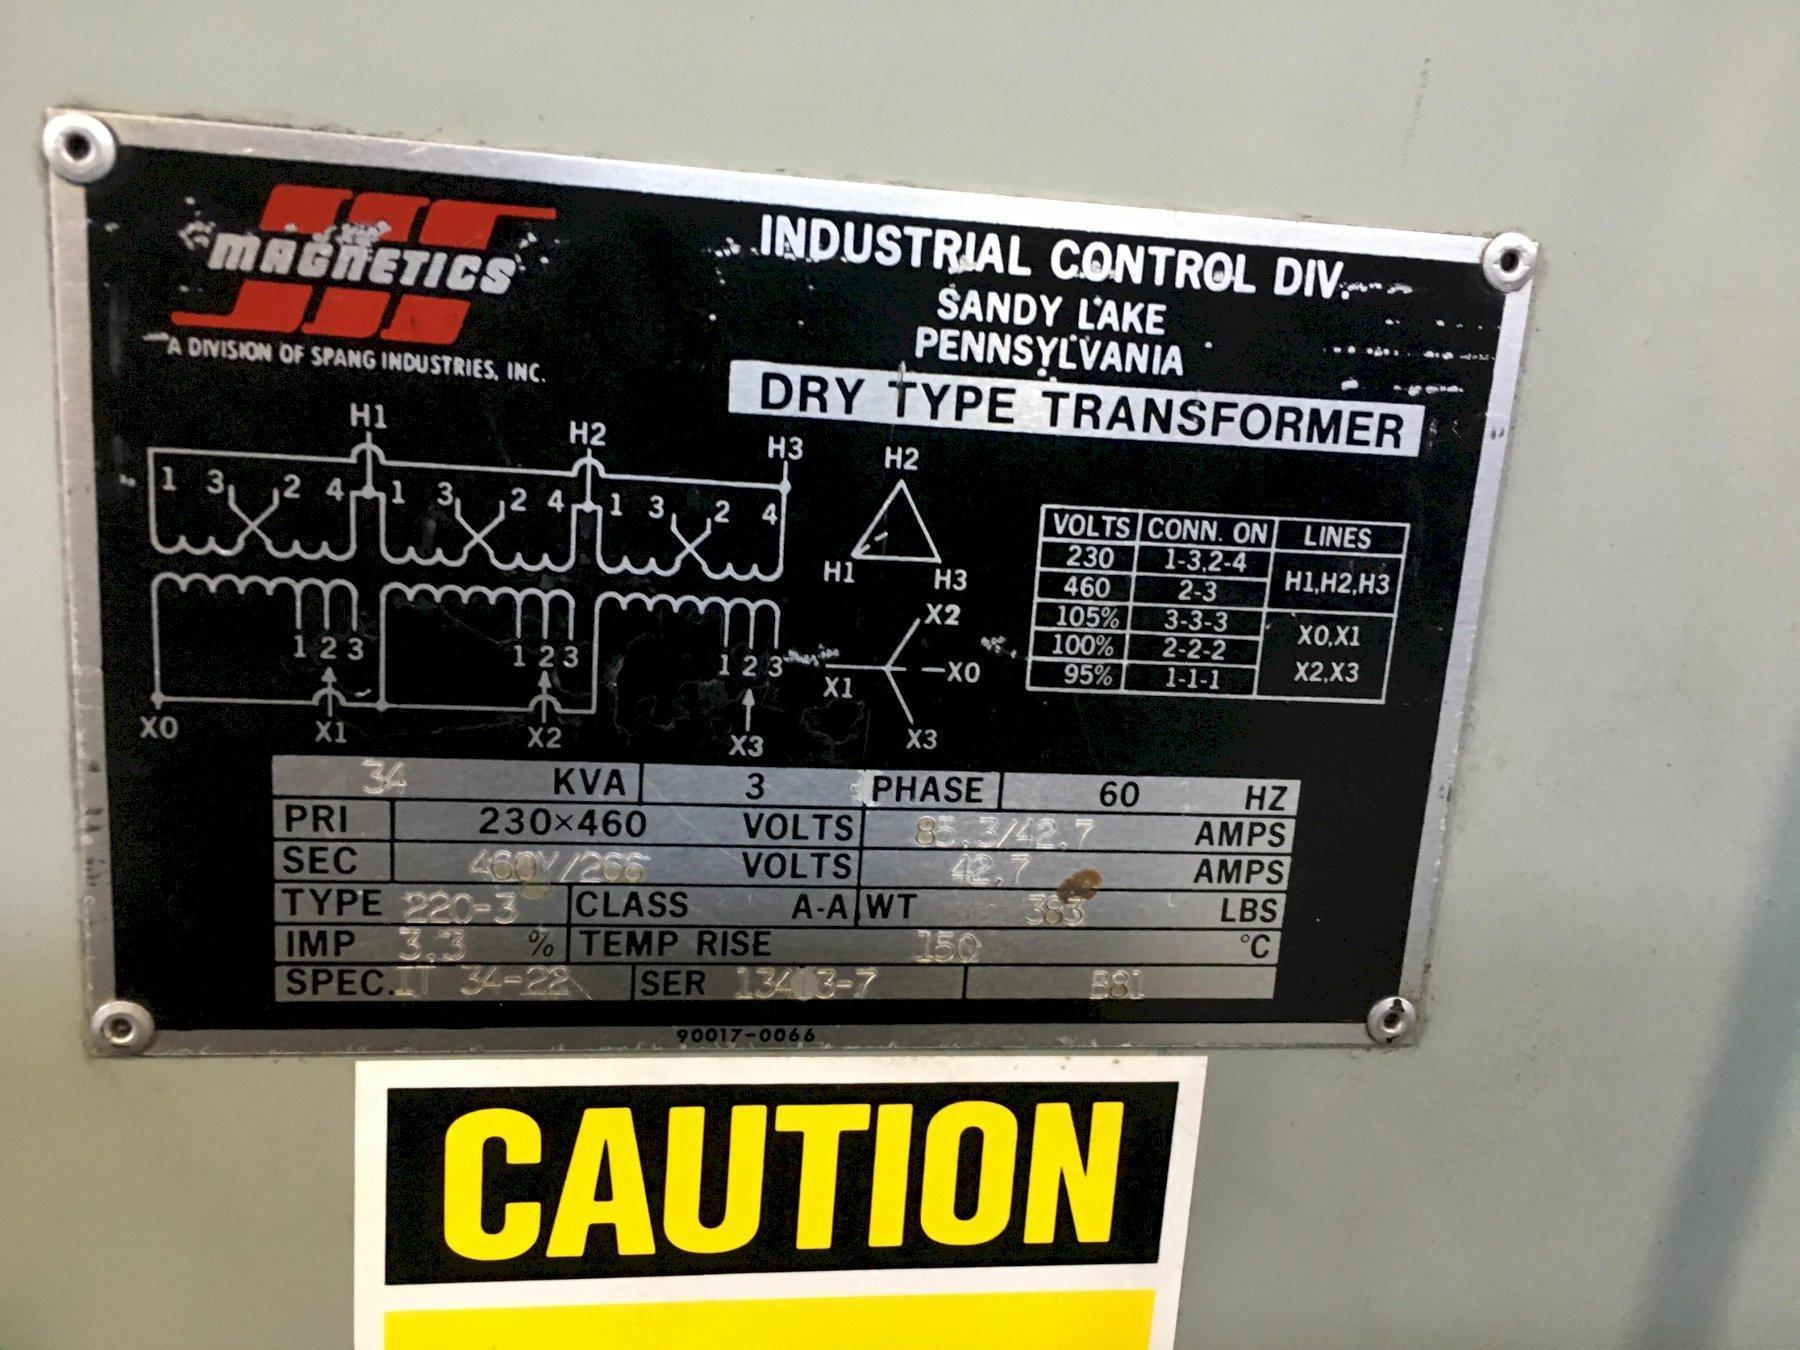 34 KVA MagneticS DRY TYPE TRANSFORMER